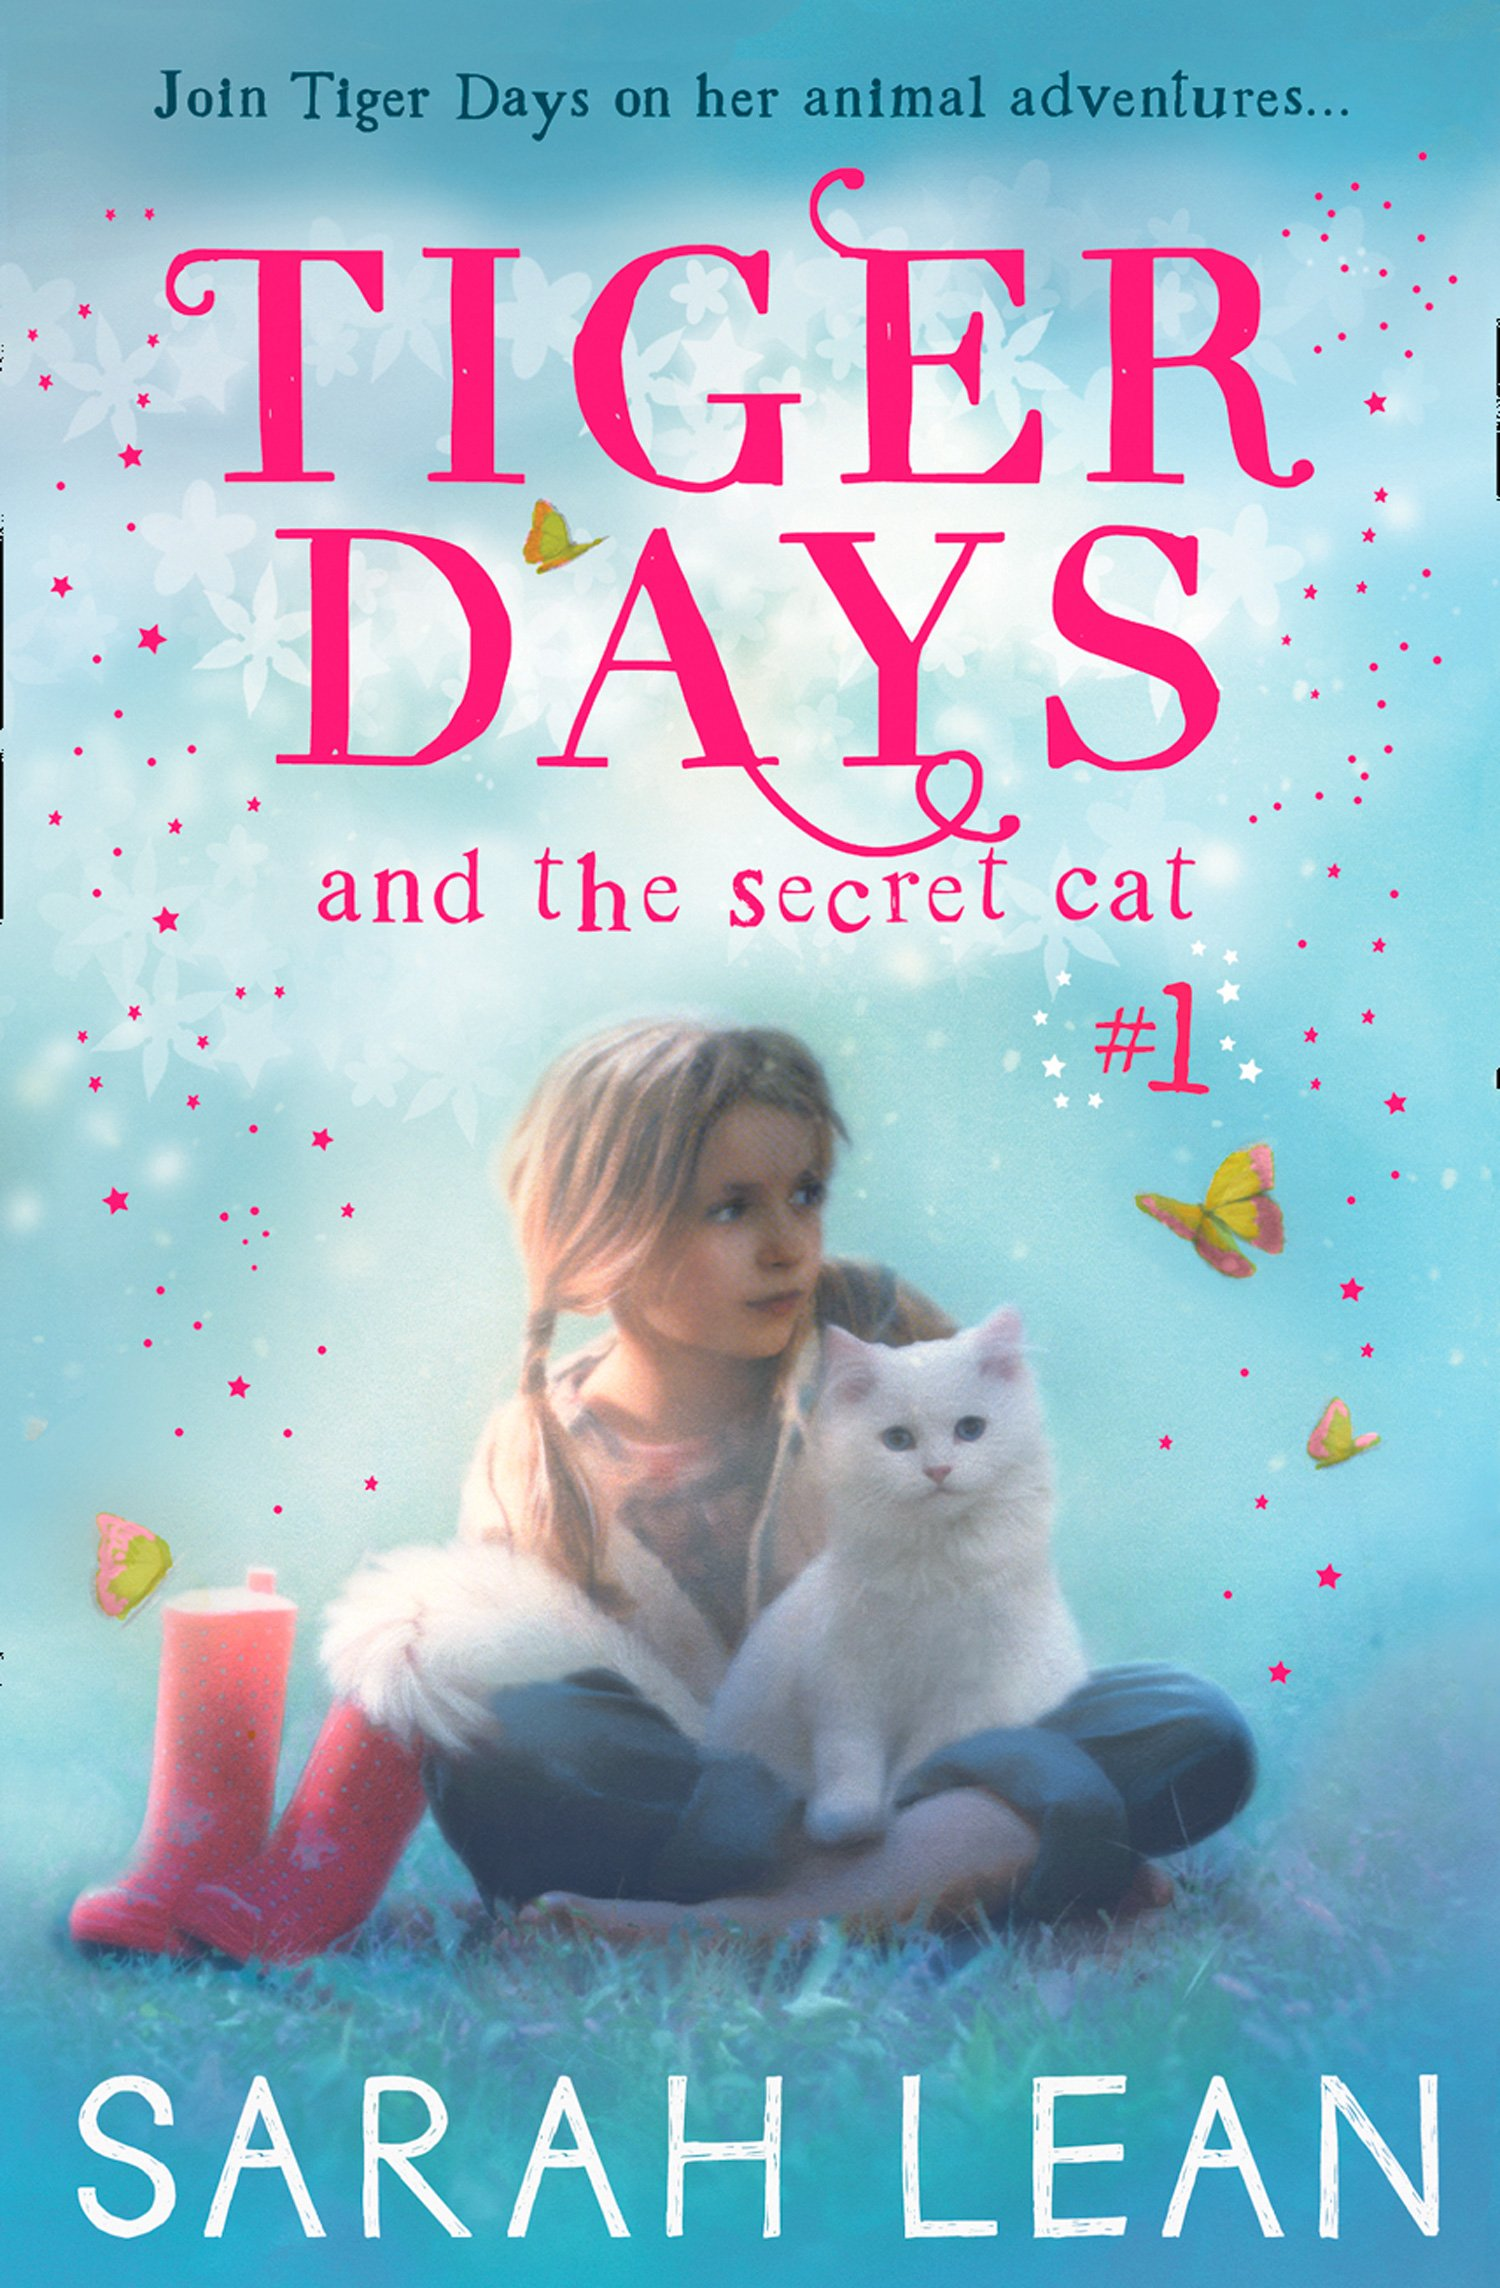 Read Online The Secret Cat (Tiger Days, Book 1) pdf